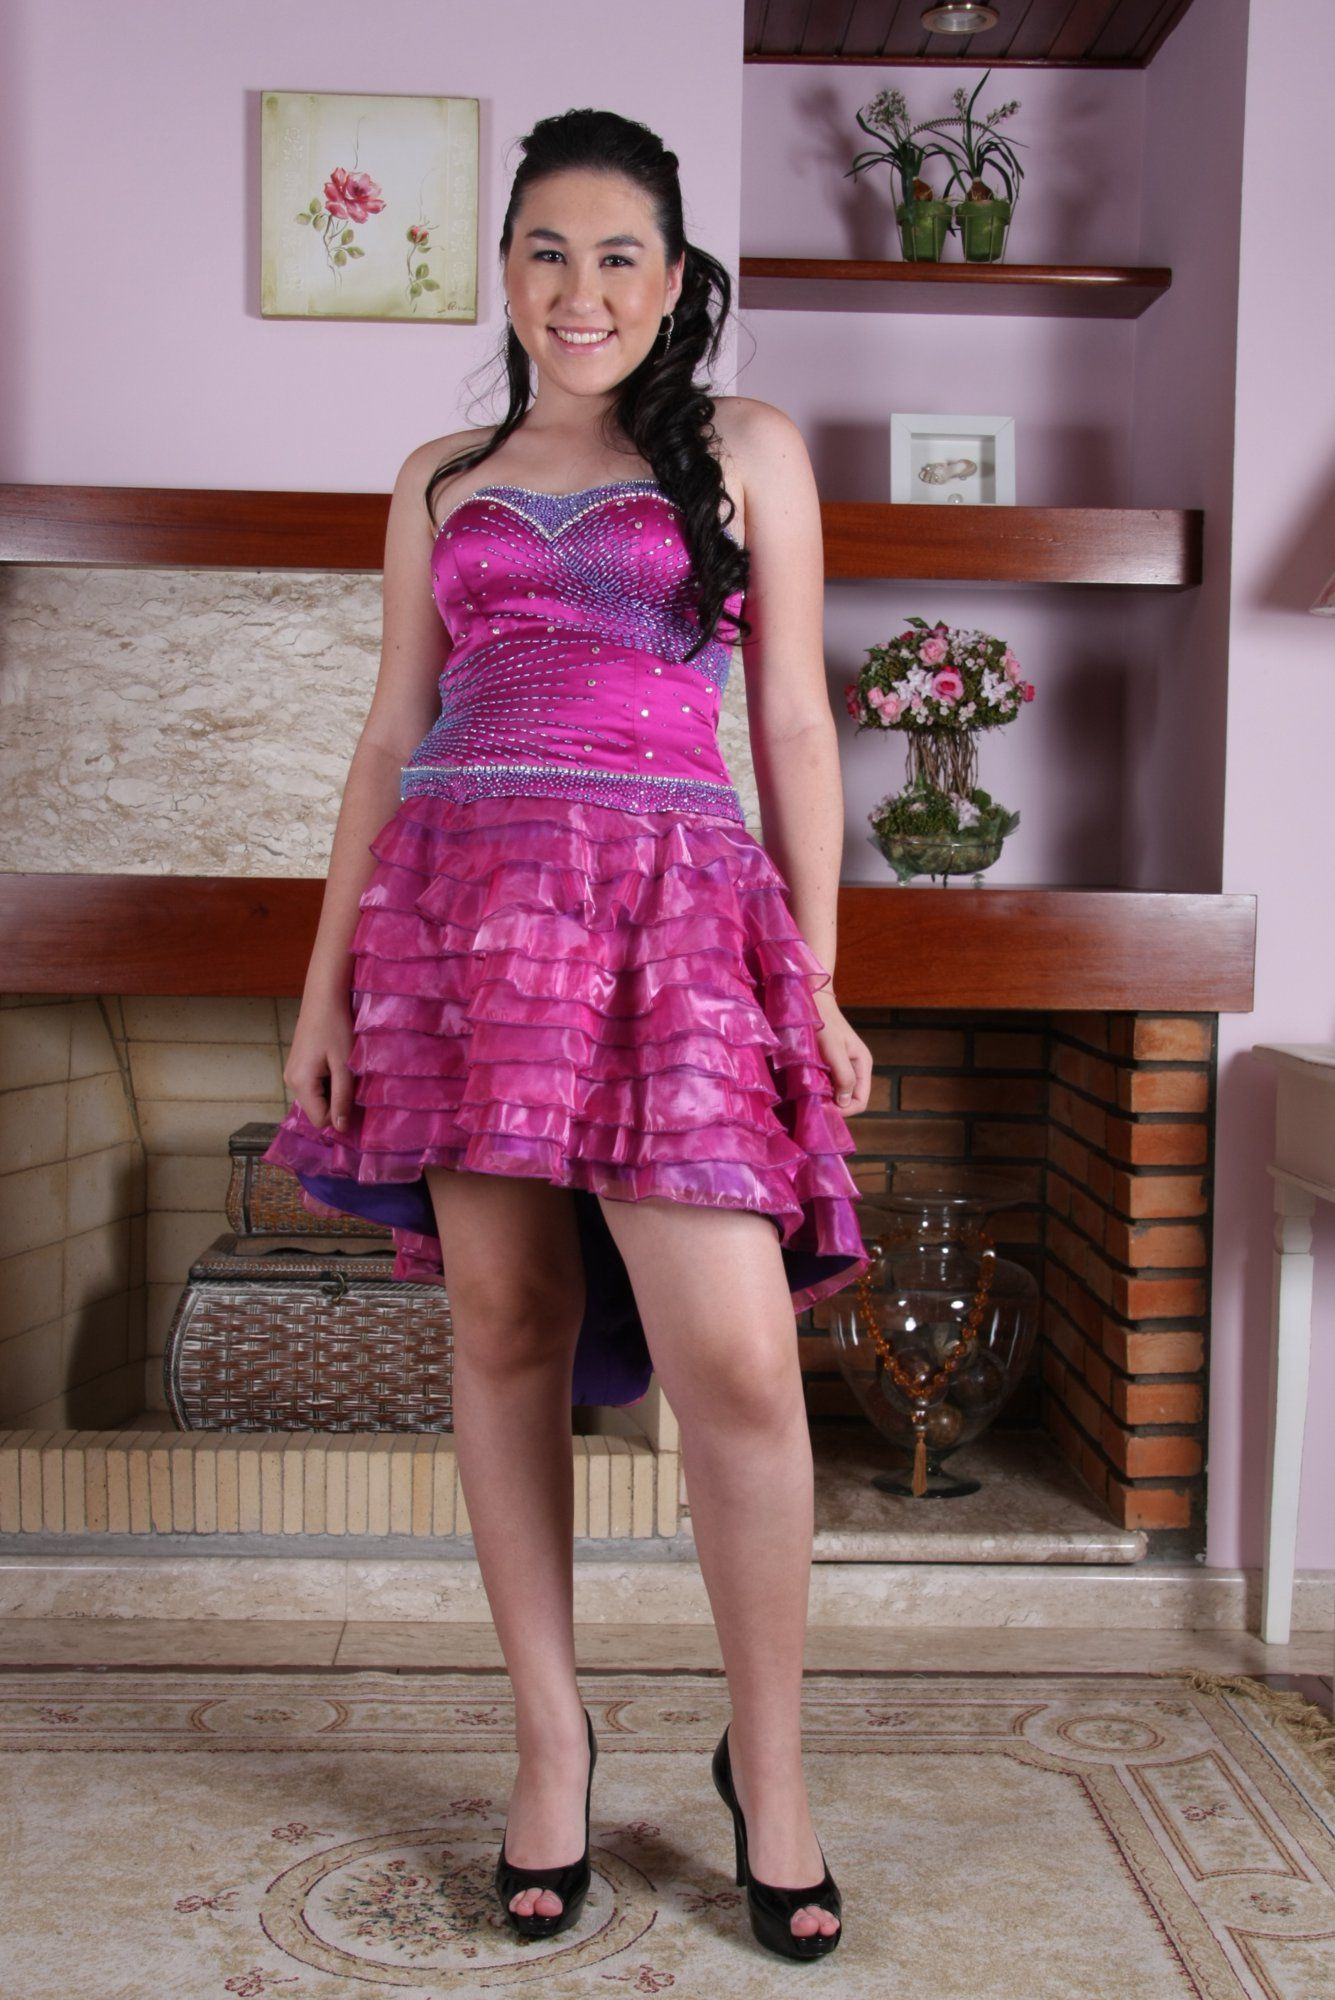 Vestido de Debutante Pink - 17 - Hipnose Alta Costura e Spa para Noivas e Noivos - Campinas - SP Vestido de Debutante, Vestido de Debutante Pink, Hipnose Alta Costura